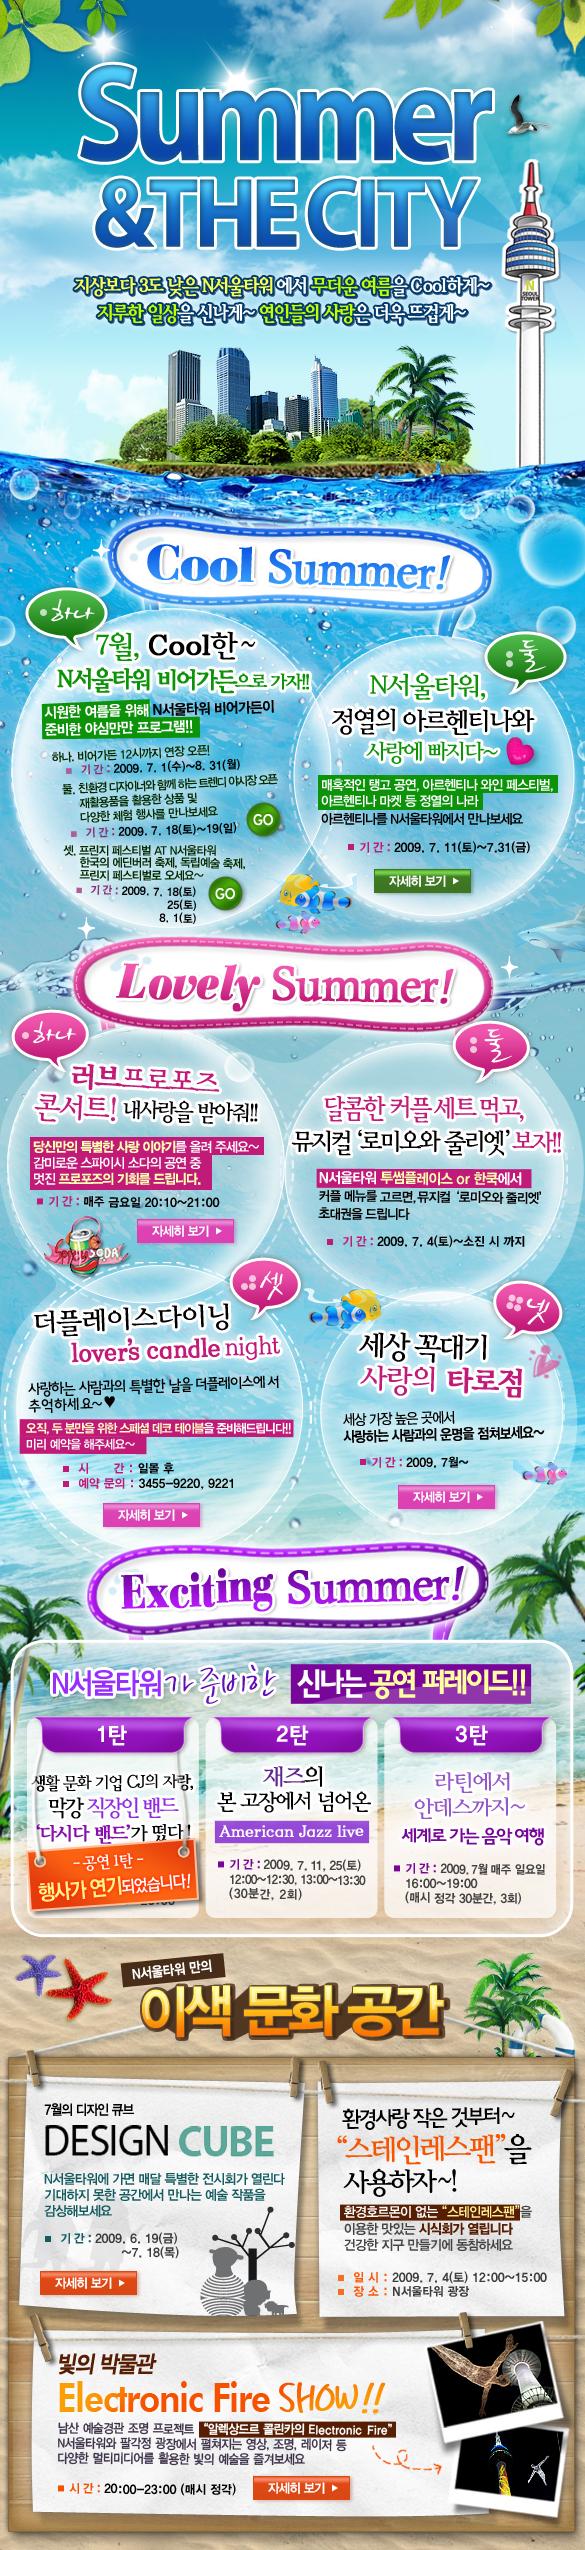 Cool Summer 이벤트